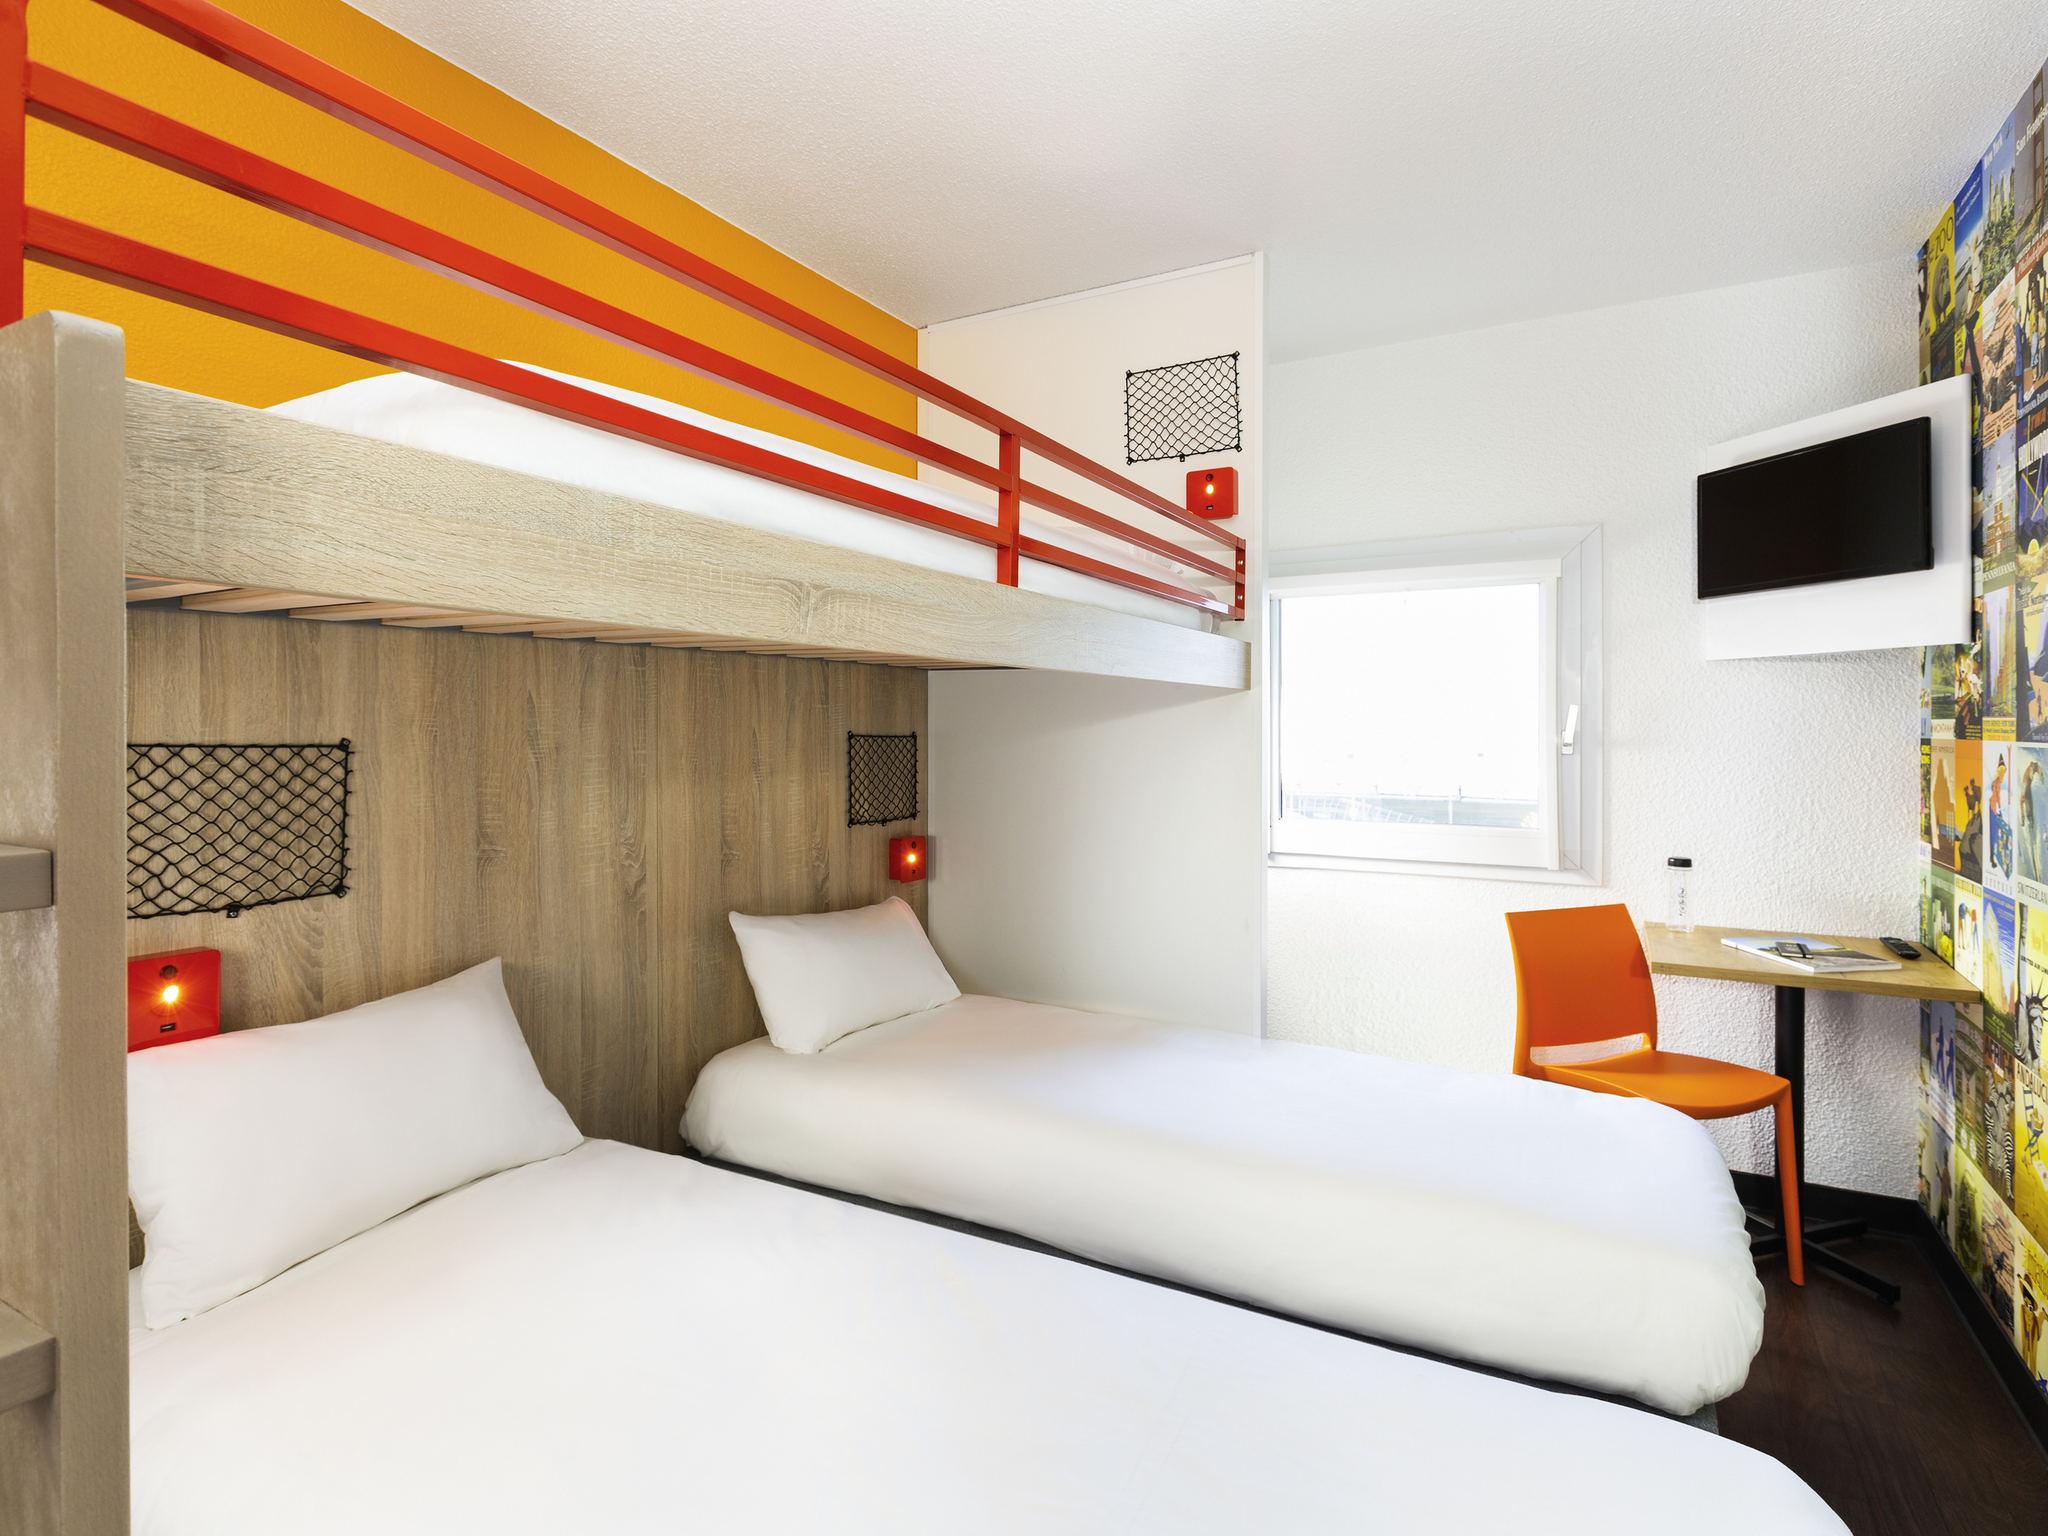 Hôtel - hotelF1 Avignon Nord